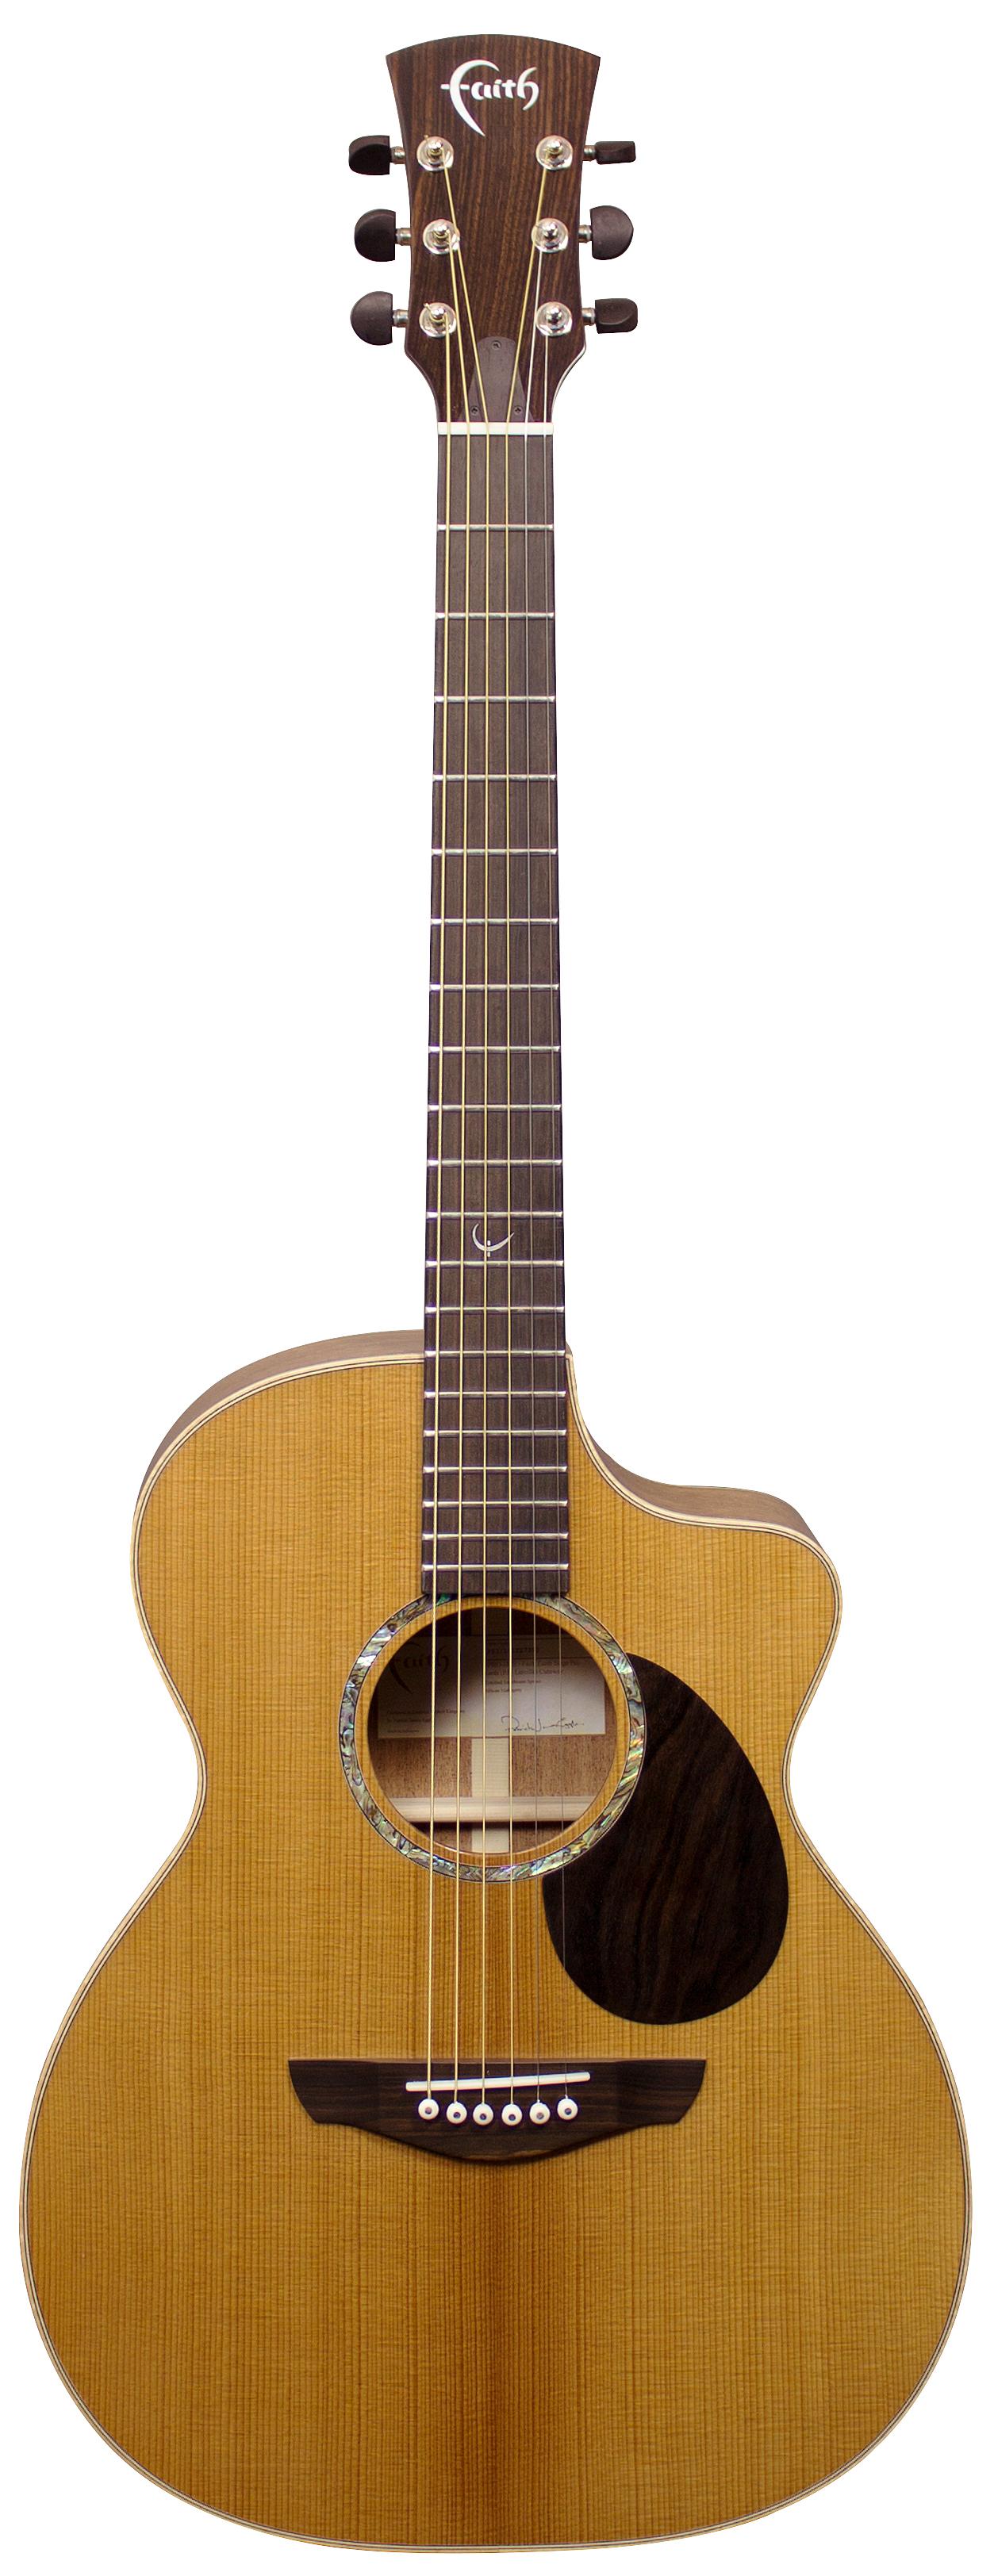 Legacy Earth Cutaway Electro Acoustic Guitar: Acoustic Guitar